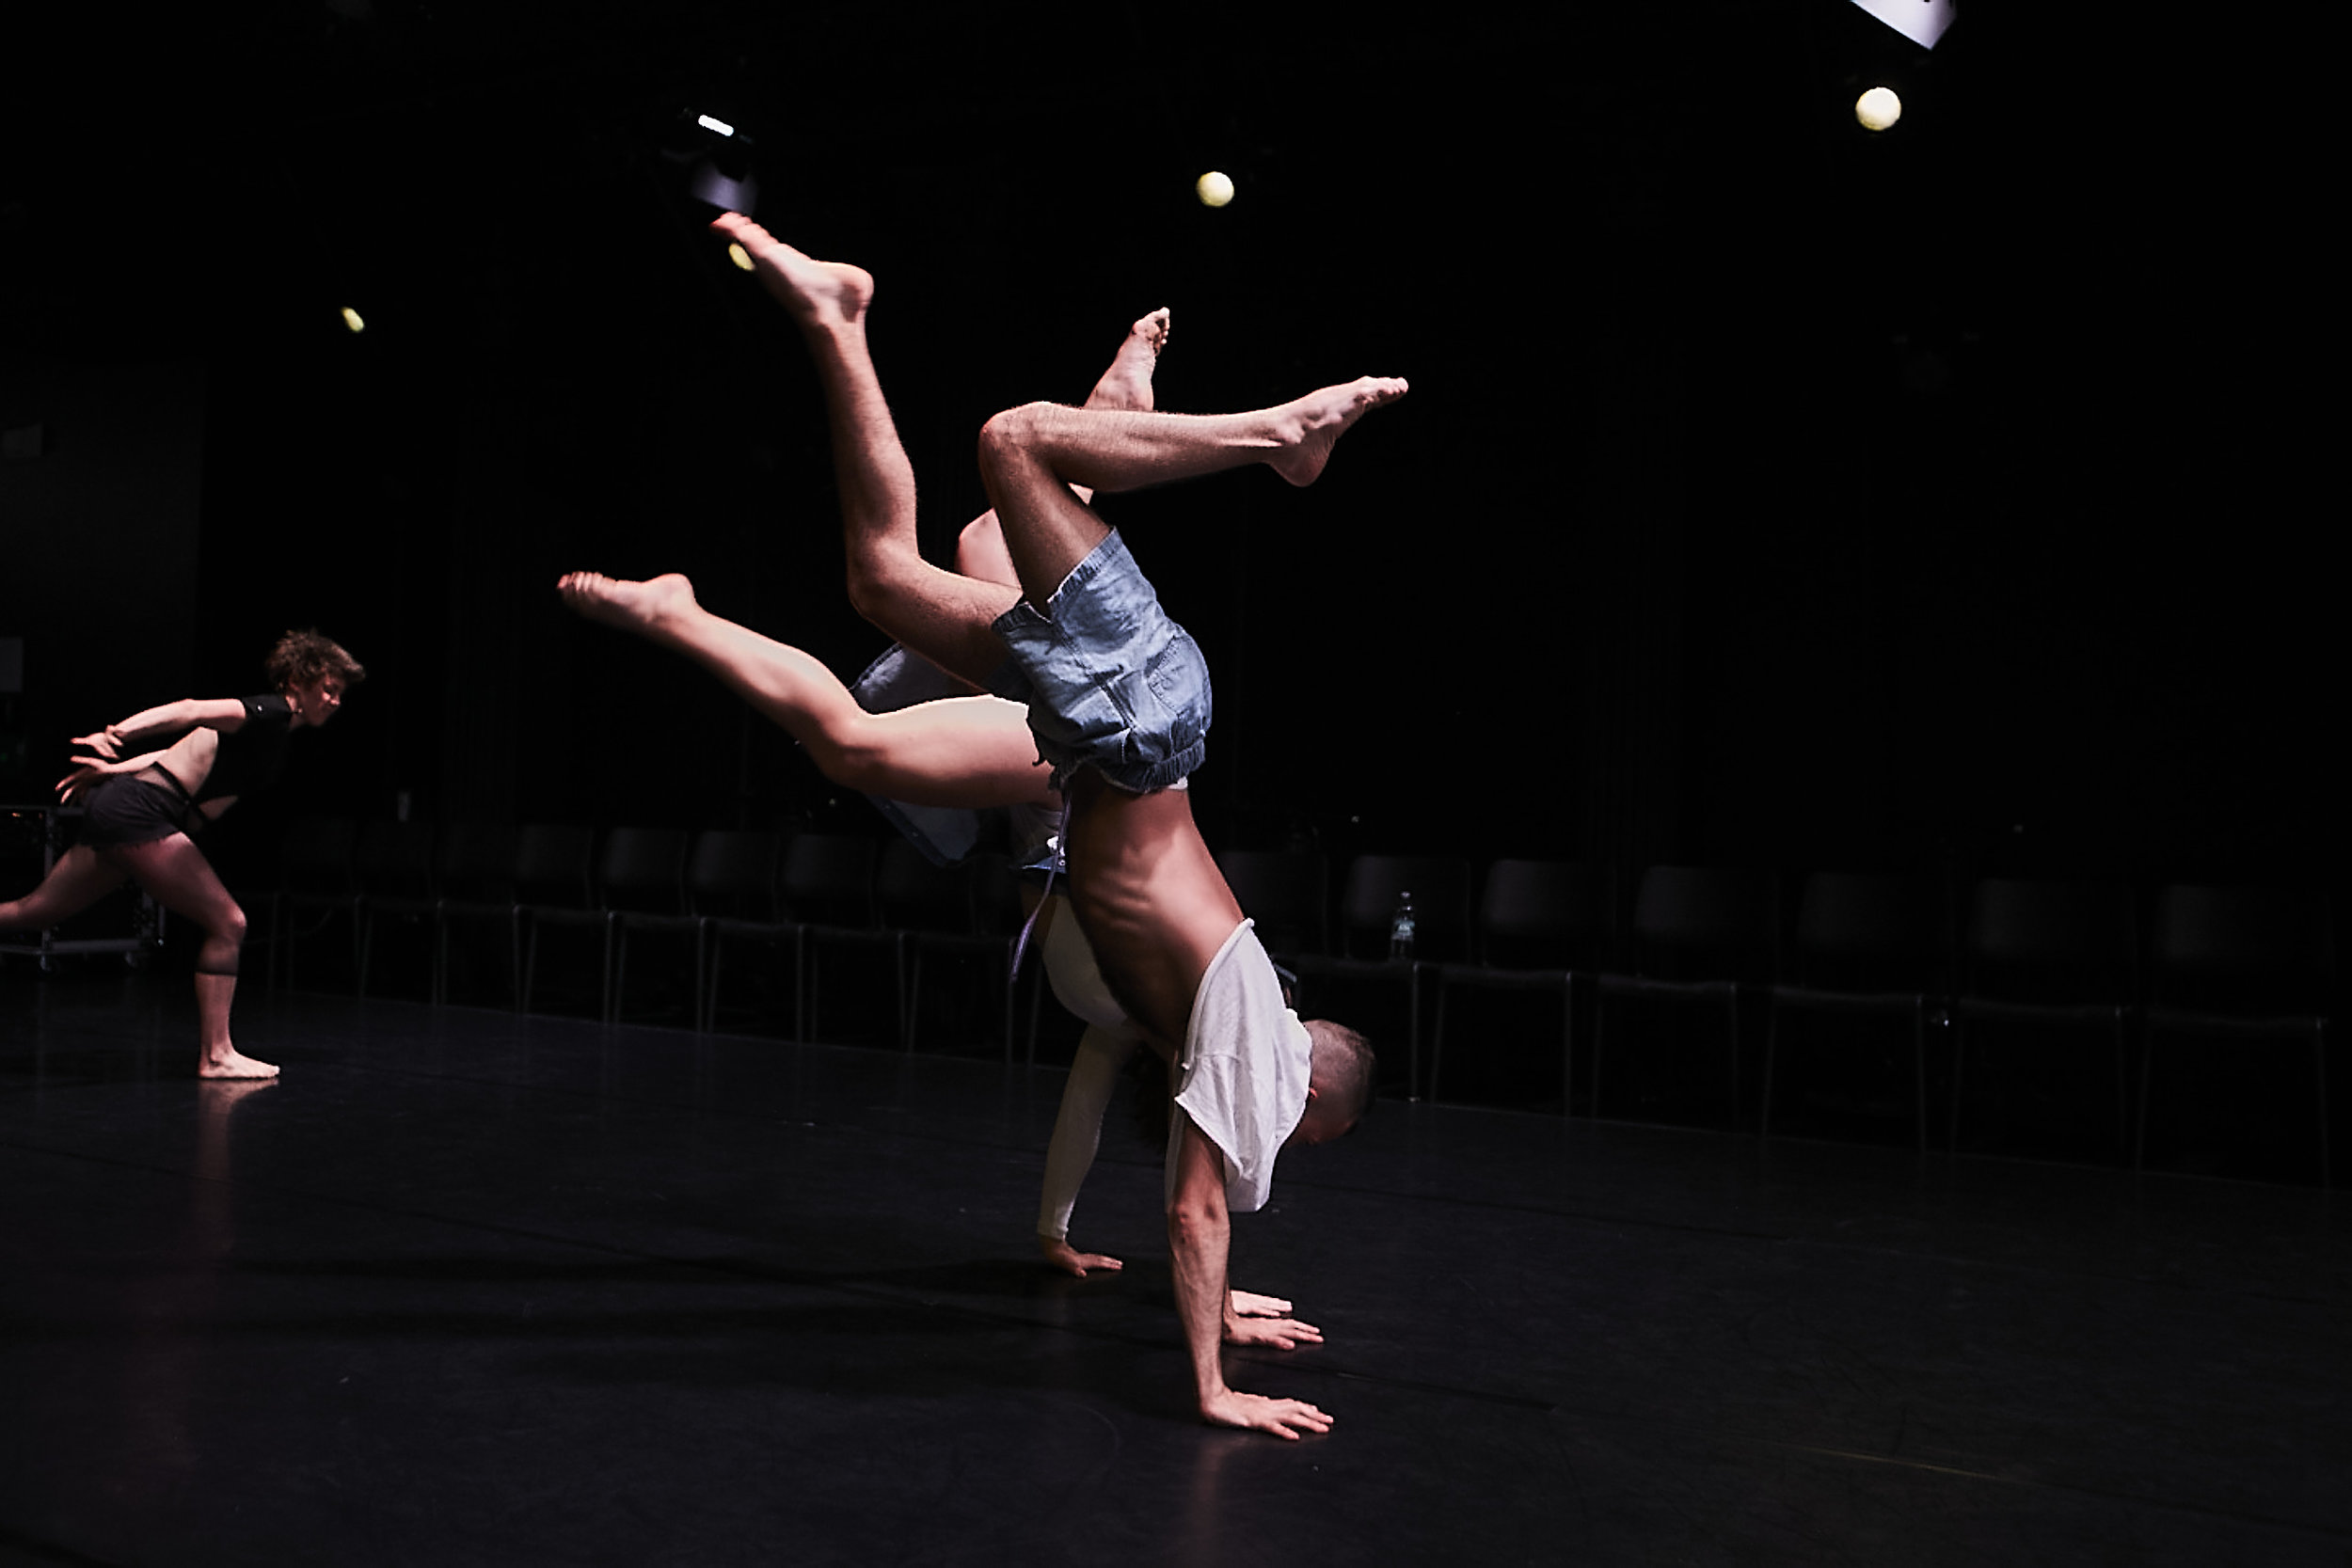 chrisbelldances-photo-by-Jeremiah Cumberbatch.jpg